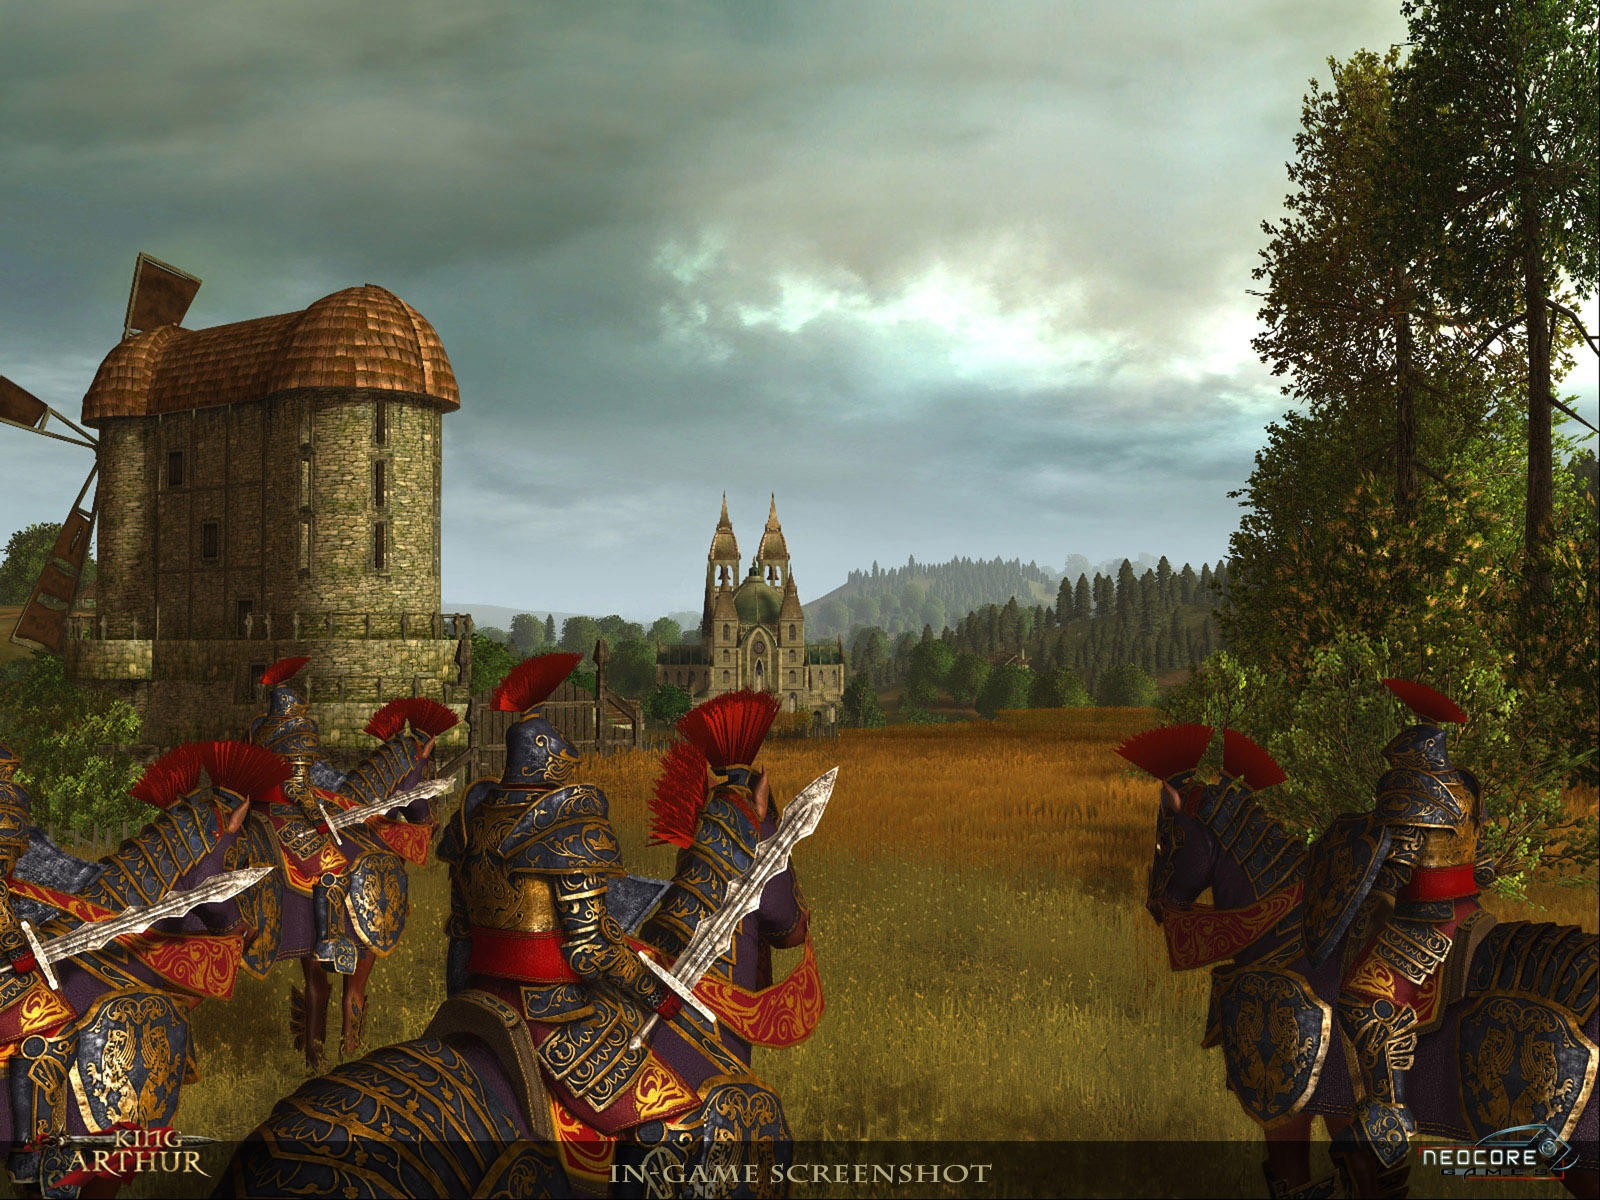 King Arthur - Un piccolo assaggio